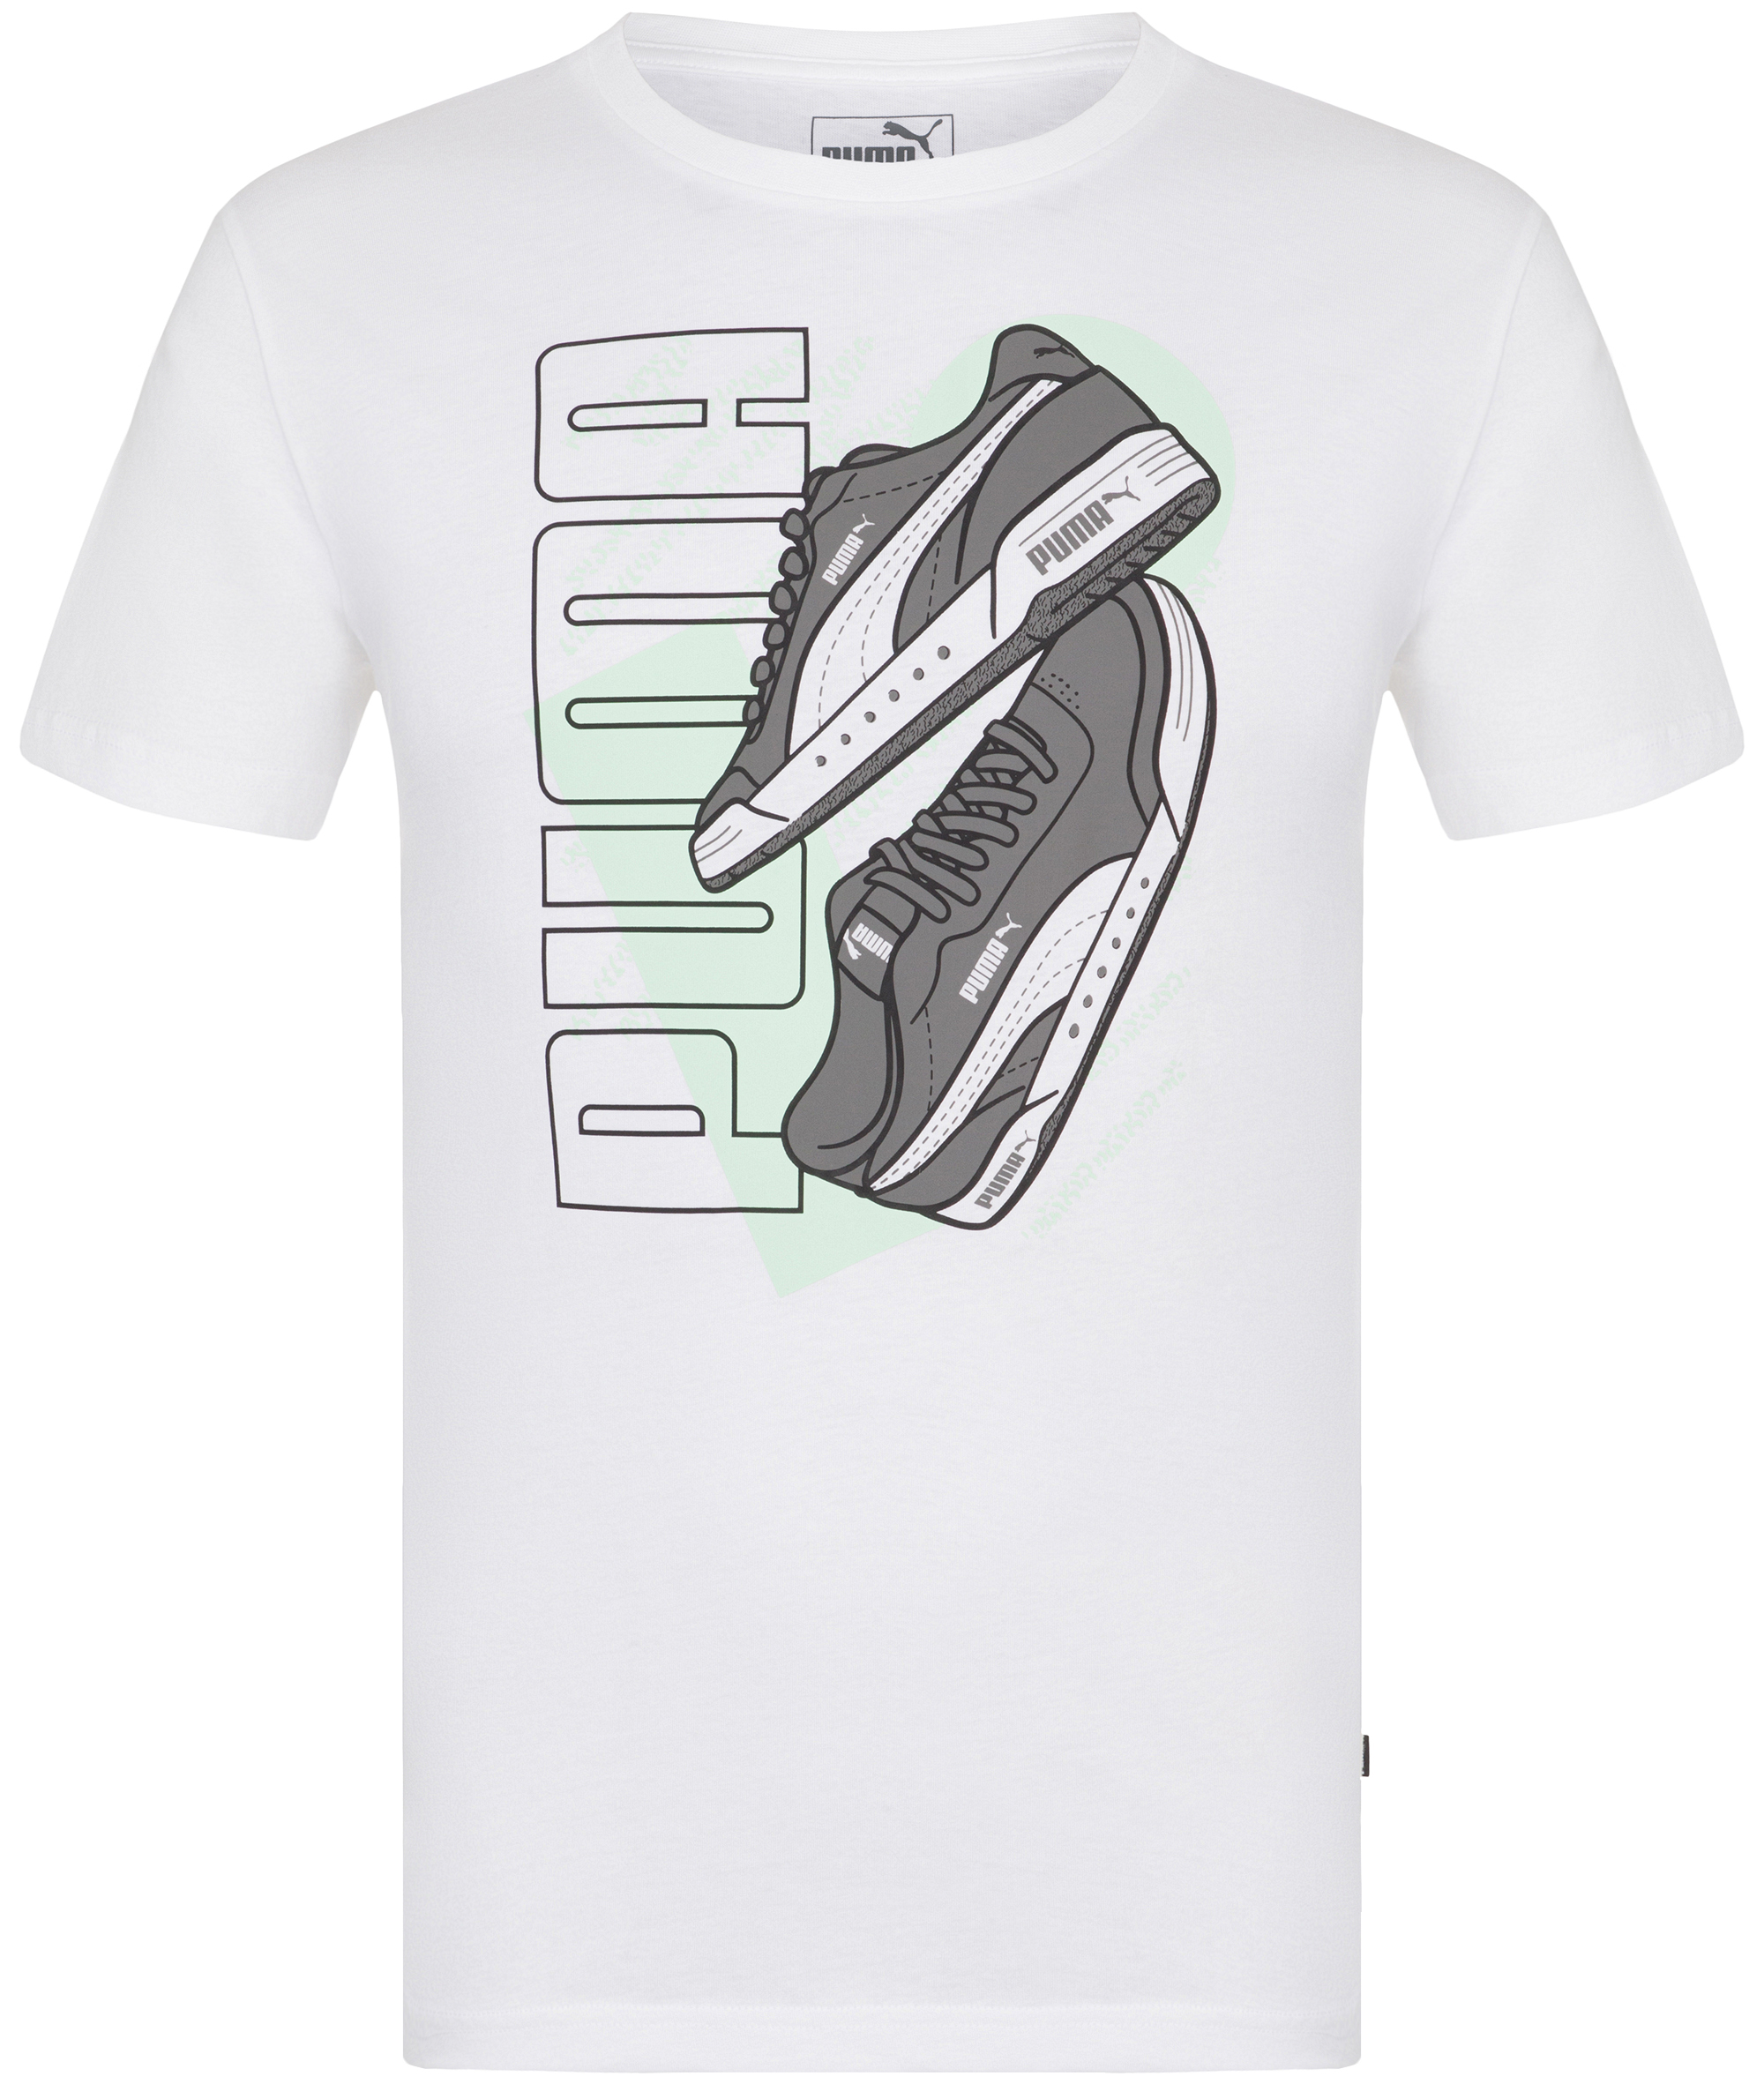 Puma Футболка мужская Puma Sneaker Graphic Tee, размер 48-50 puma футболка мужская puma aop split tee размер 48 50